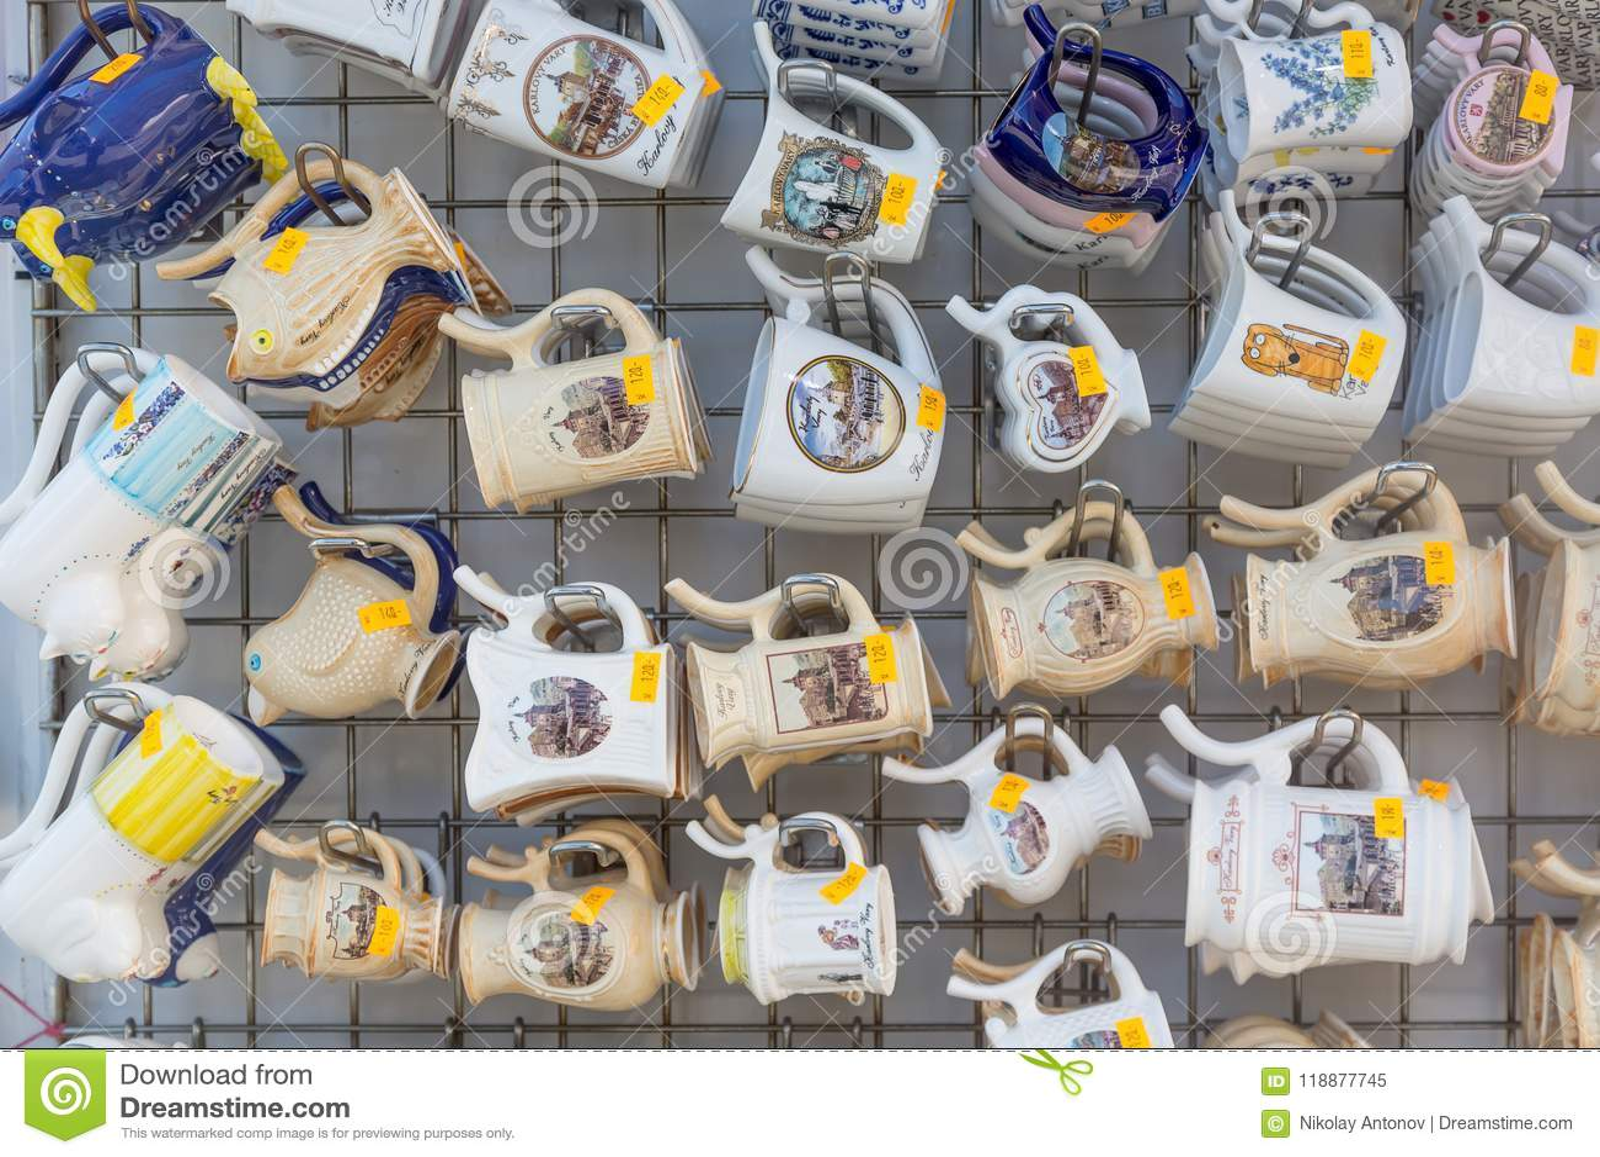 Karlovy Vary, Czech Republic - April, 2018: Many mug souvenirs at a tourist shop. SPA resort in Czech Republic. Karlovy Vary is kn